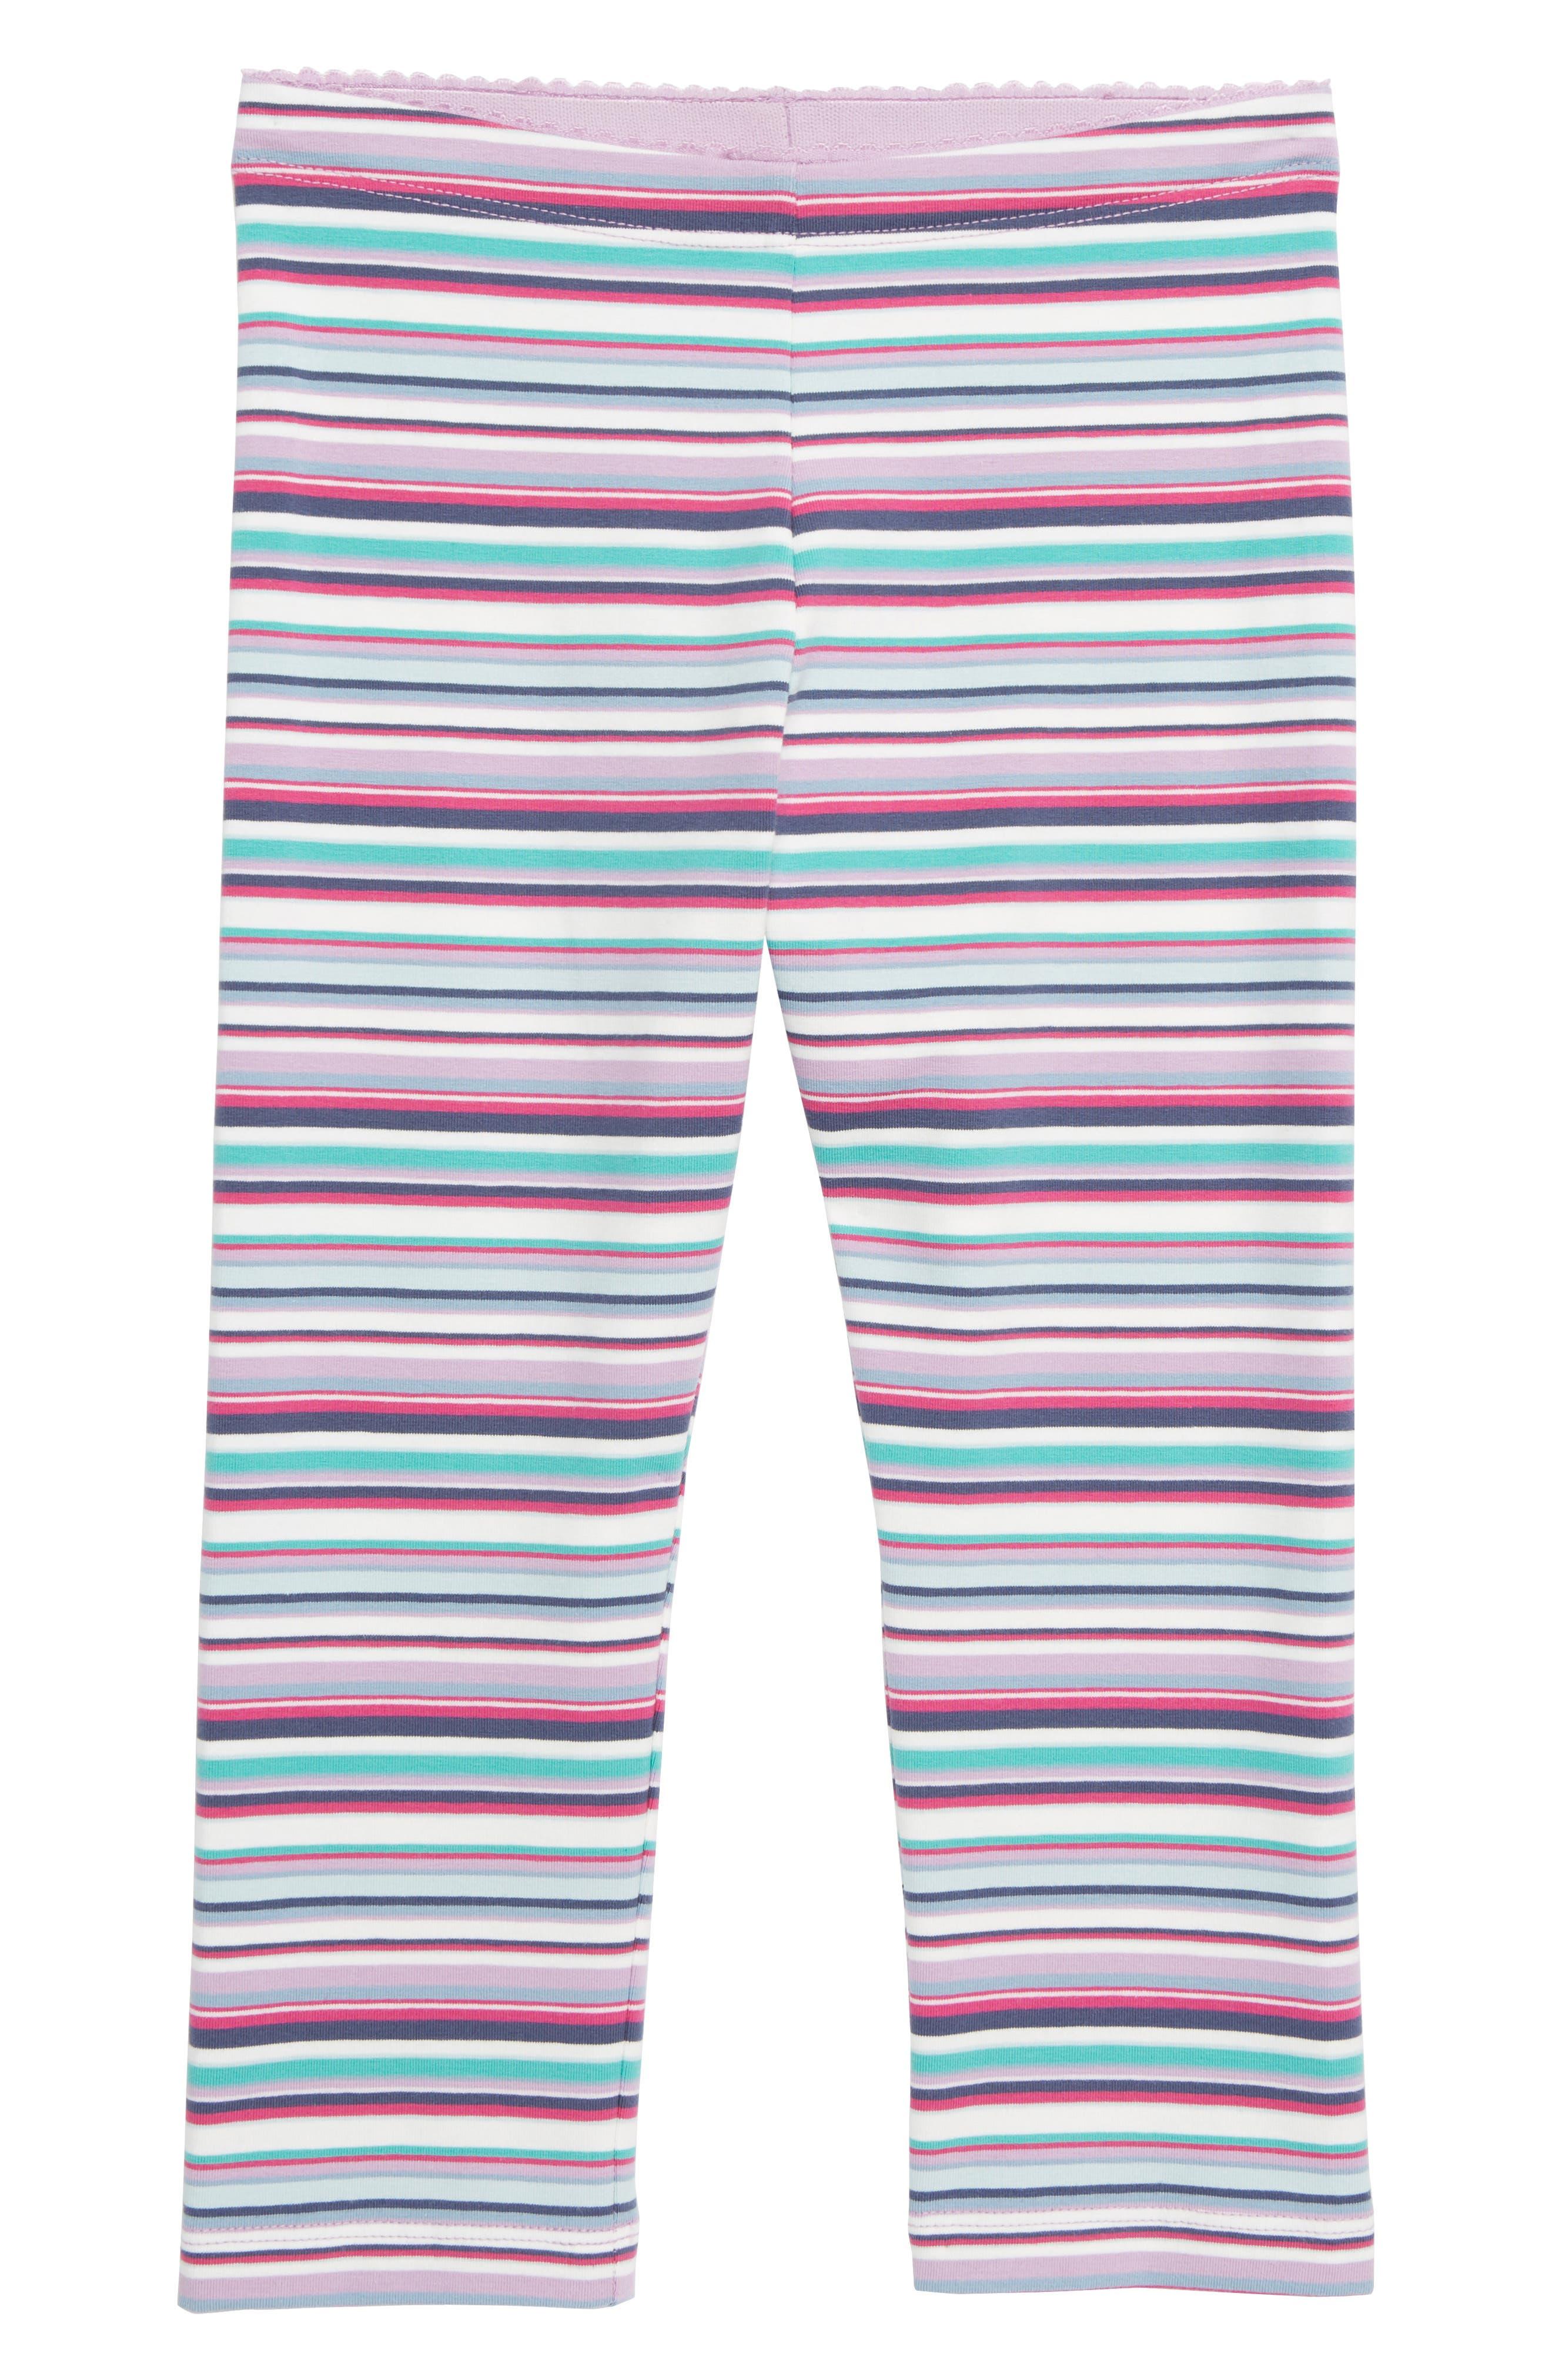 Stripe Caprili Leggings, Main, color, ASTER